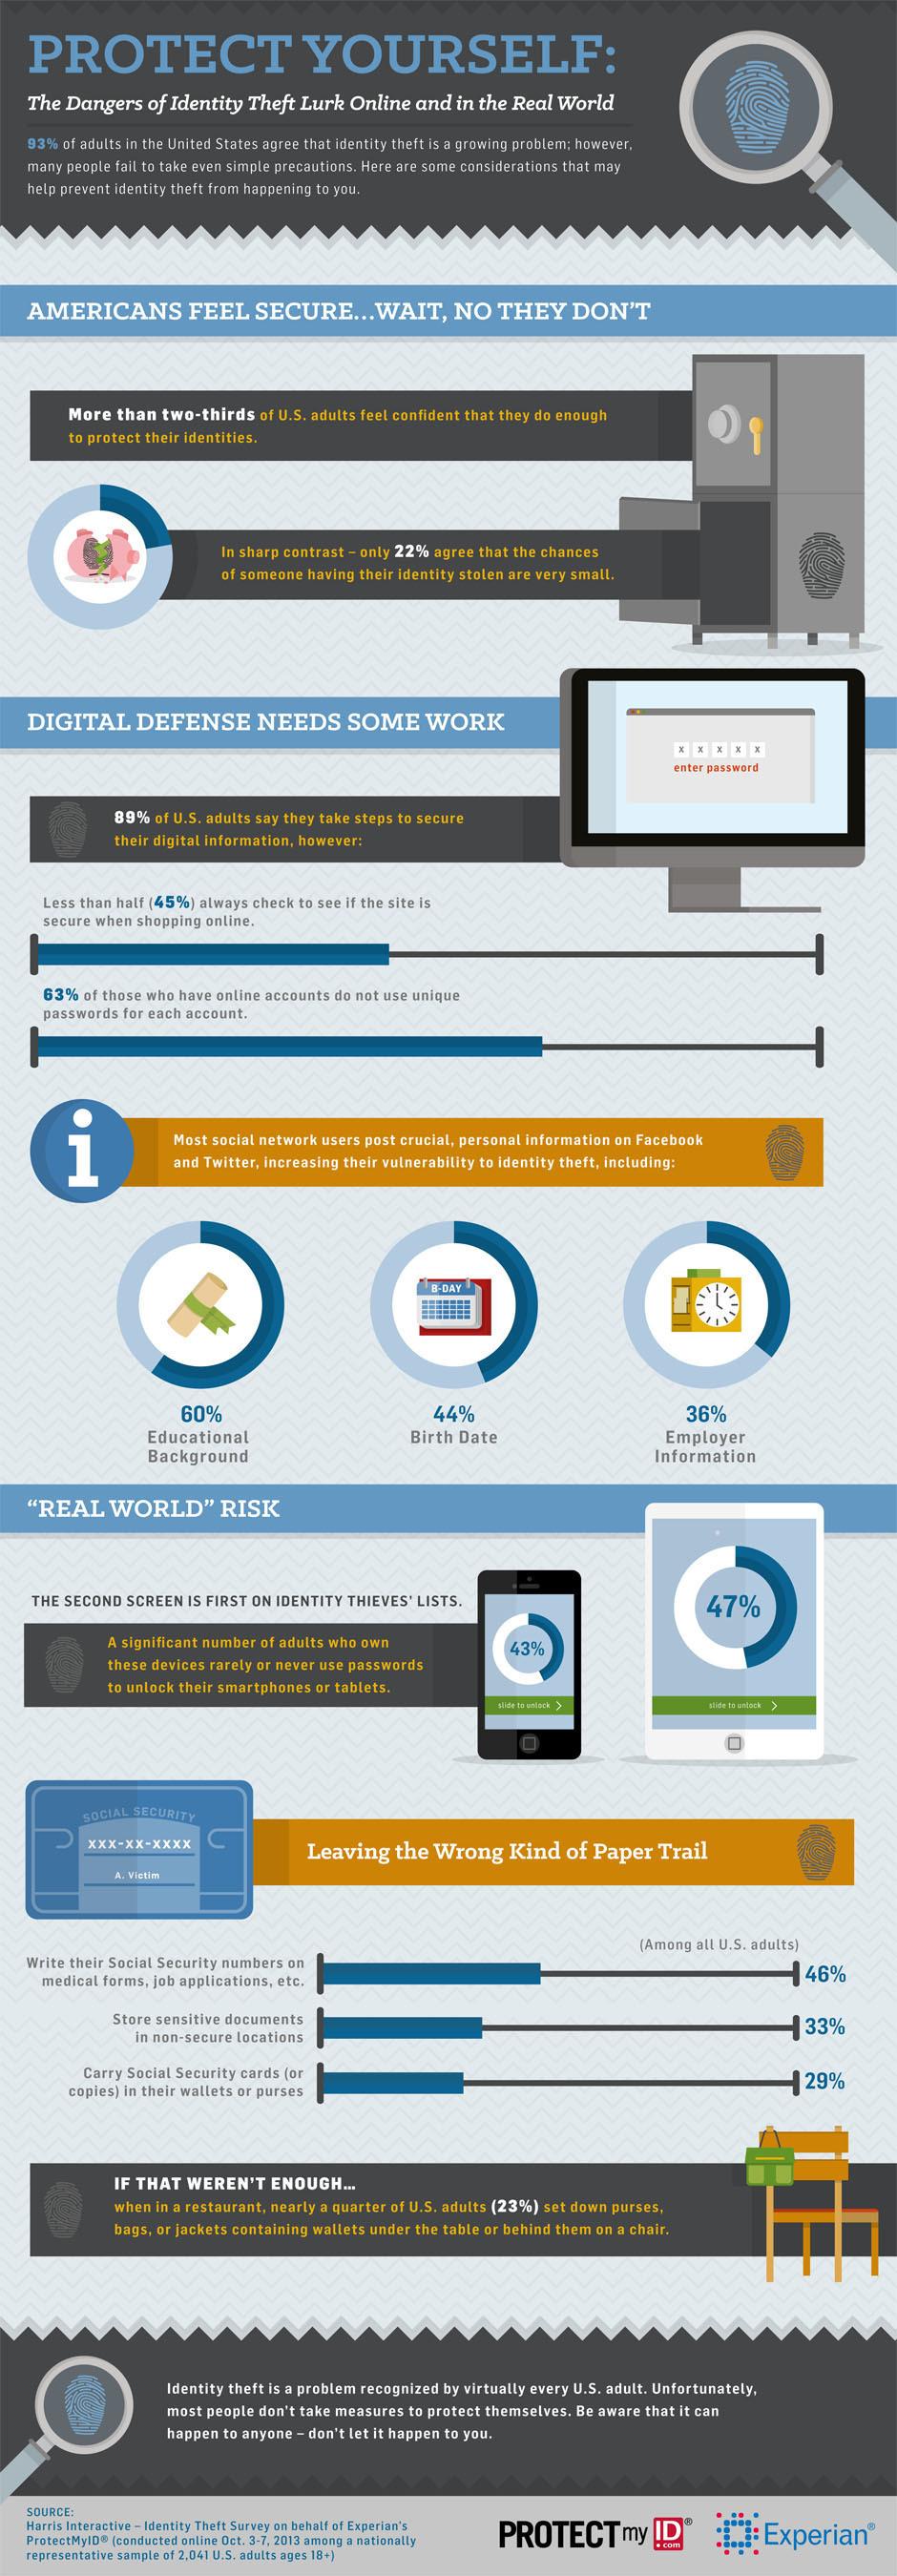 Many consumers fear identity theft yet still engage in risky behavior. (PRNewsFoto/Experian) ...